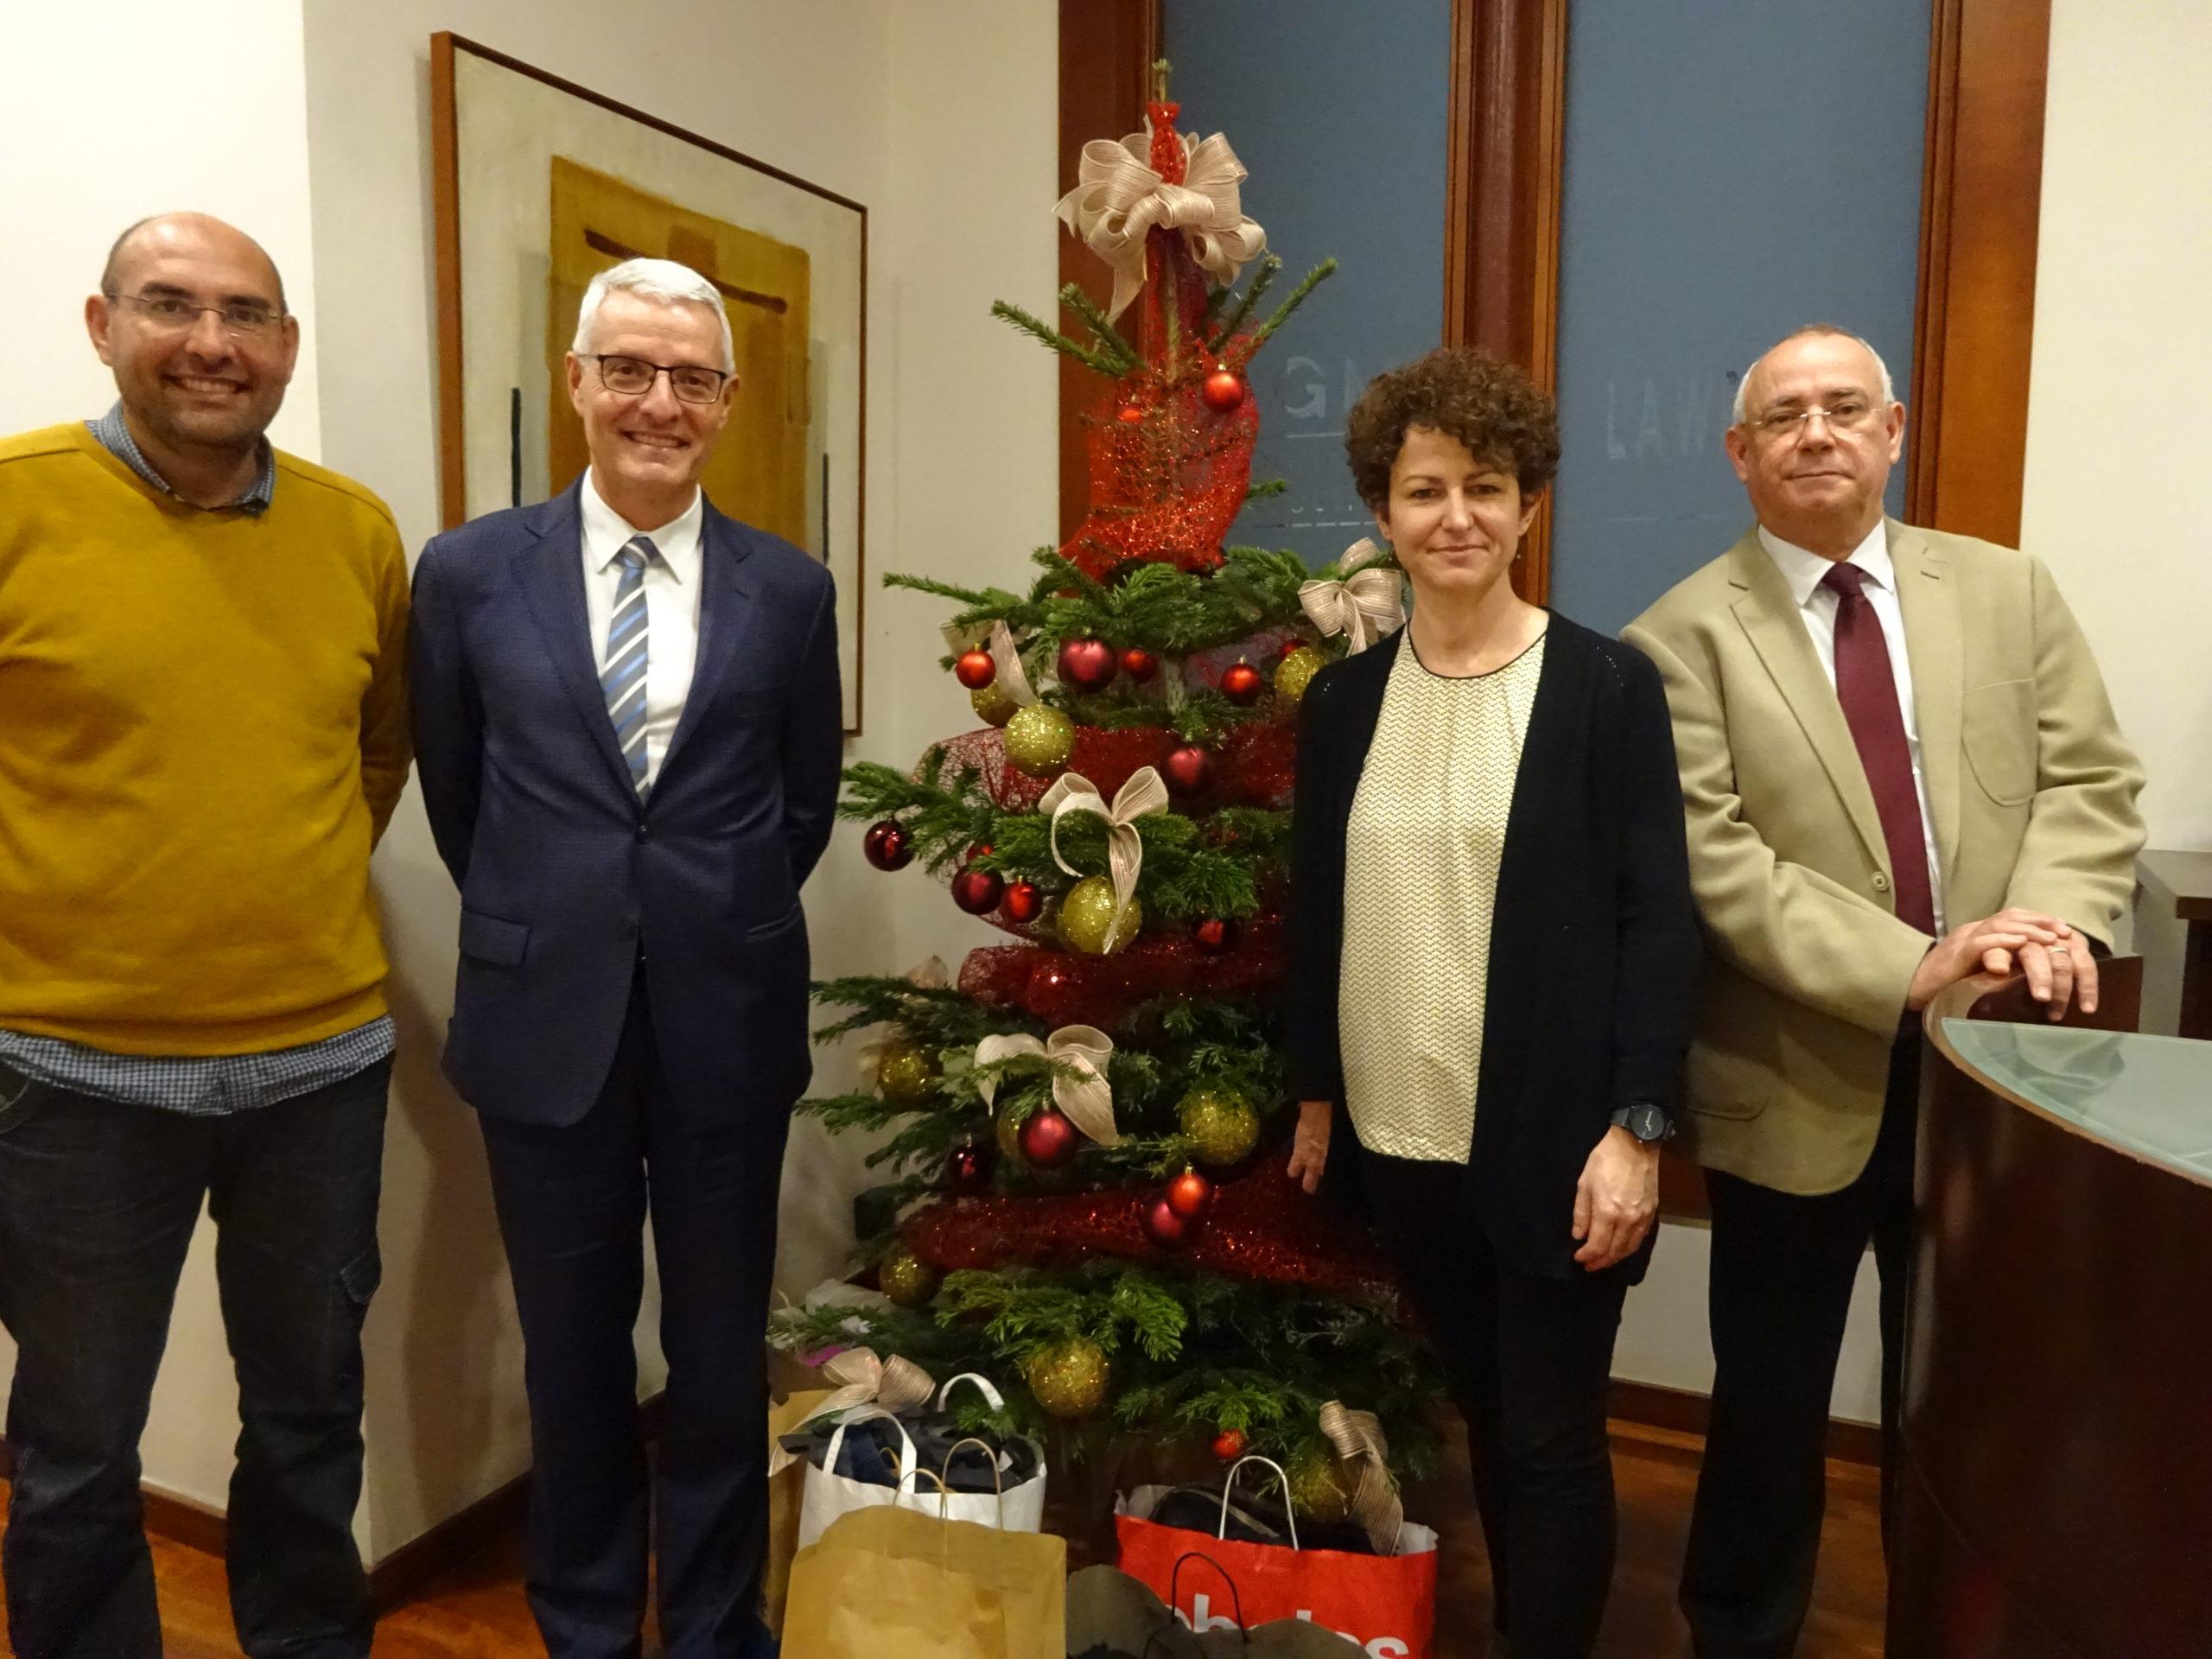 AGM Abogados colabora con la Fundació Pere Tarrés